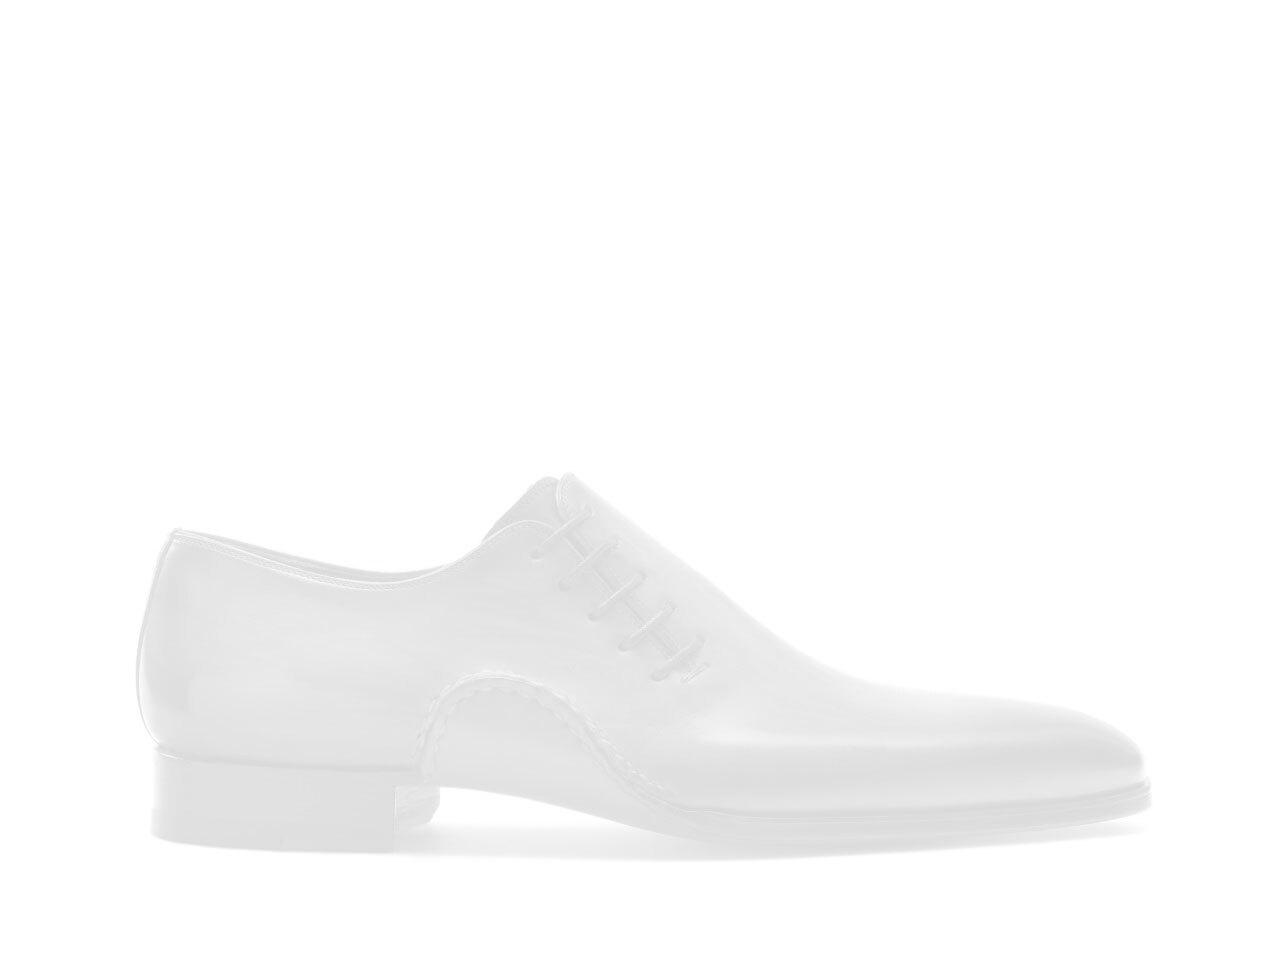 Magnanni Essential Shoe Care Kit Neutral Shoe Care Products